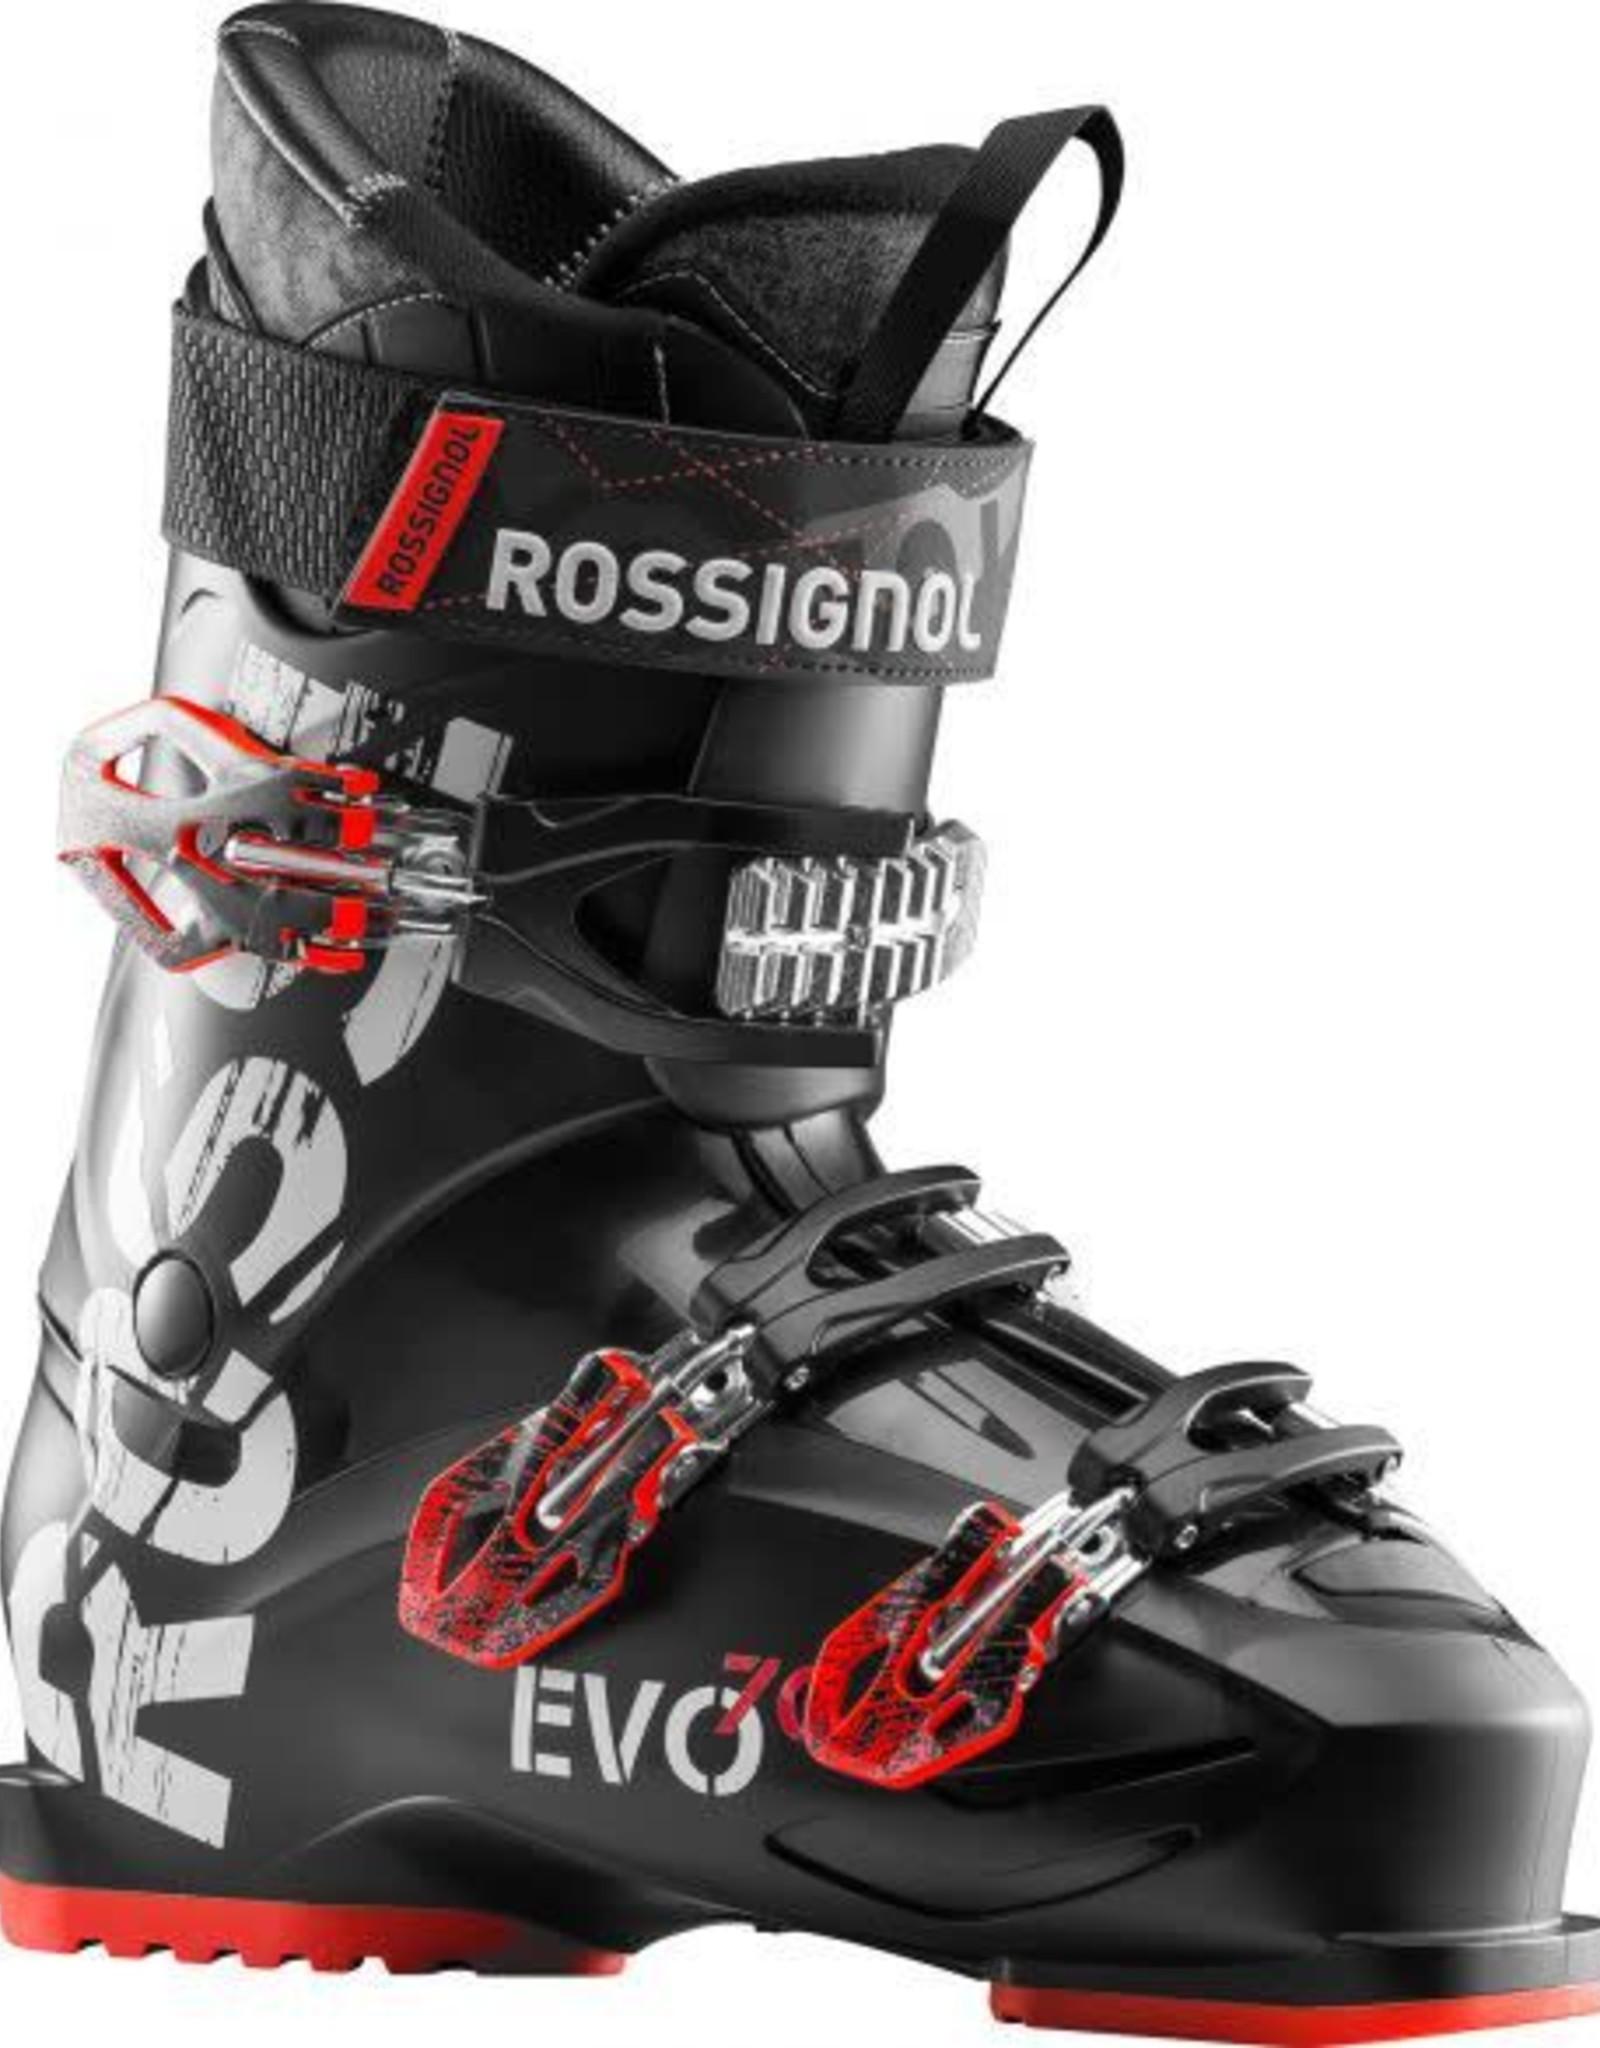 Rossignol Evo 70 RBH8160